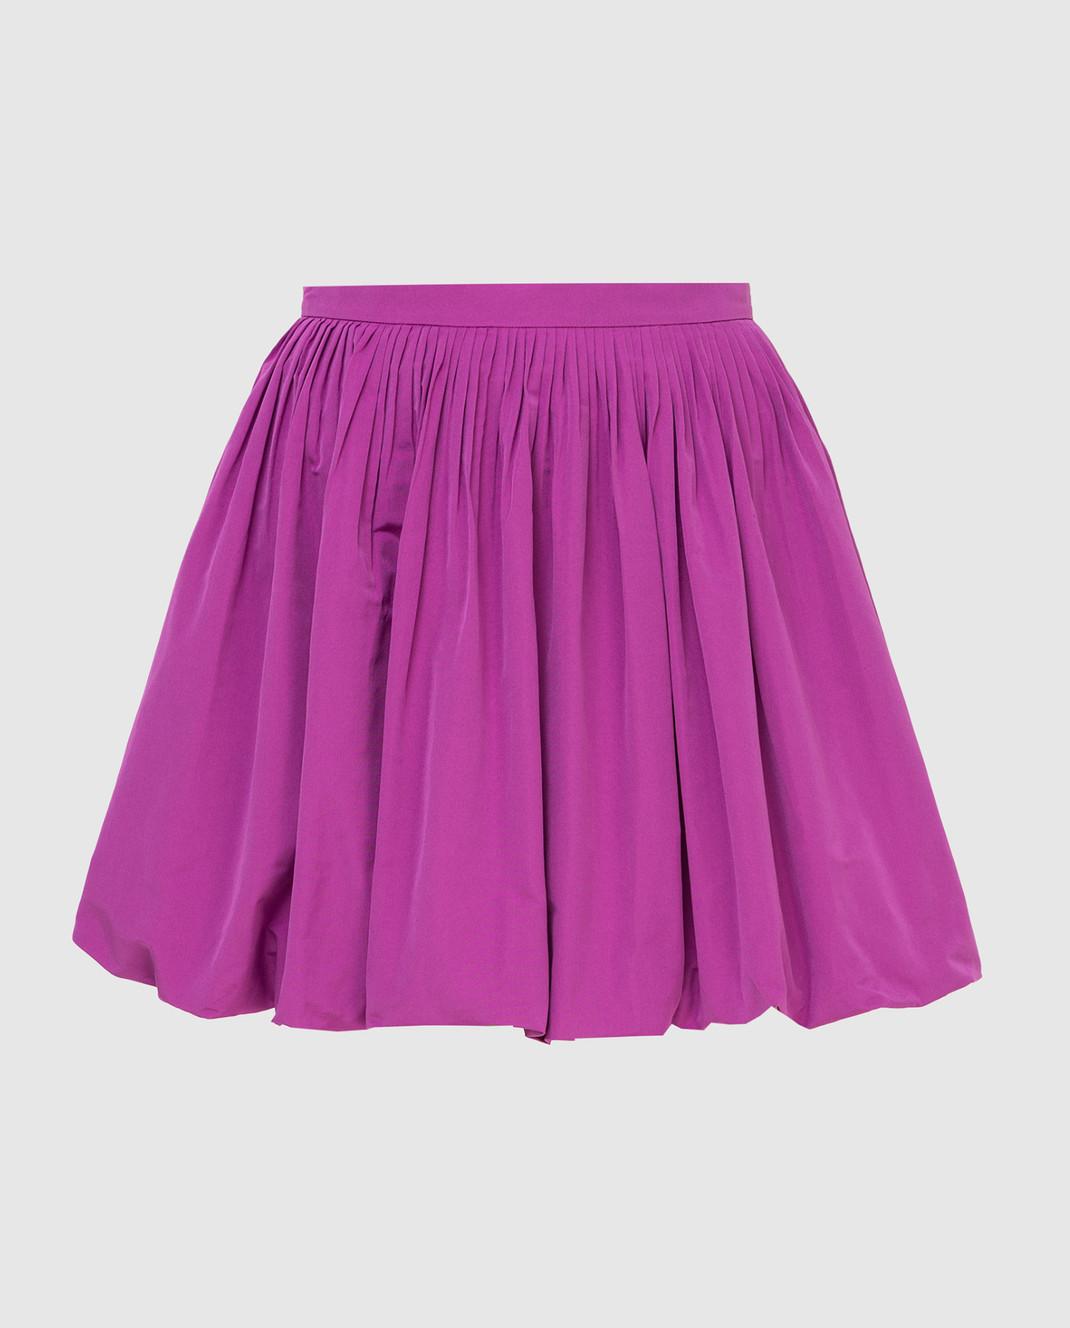 Valentino Сиреневая юбка изображение 1